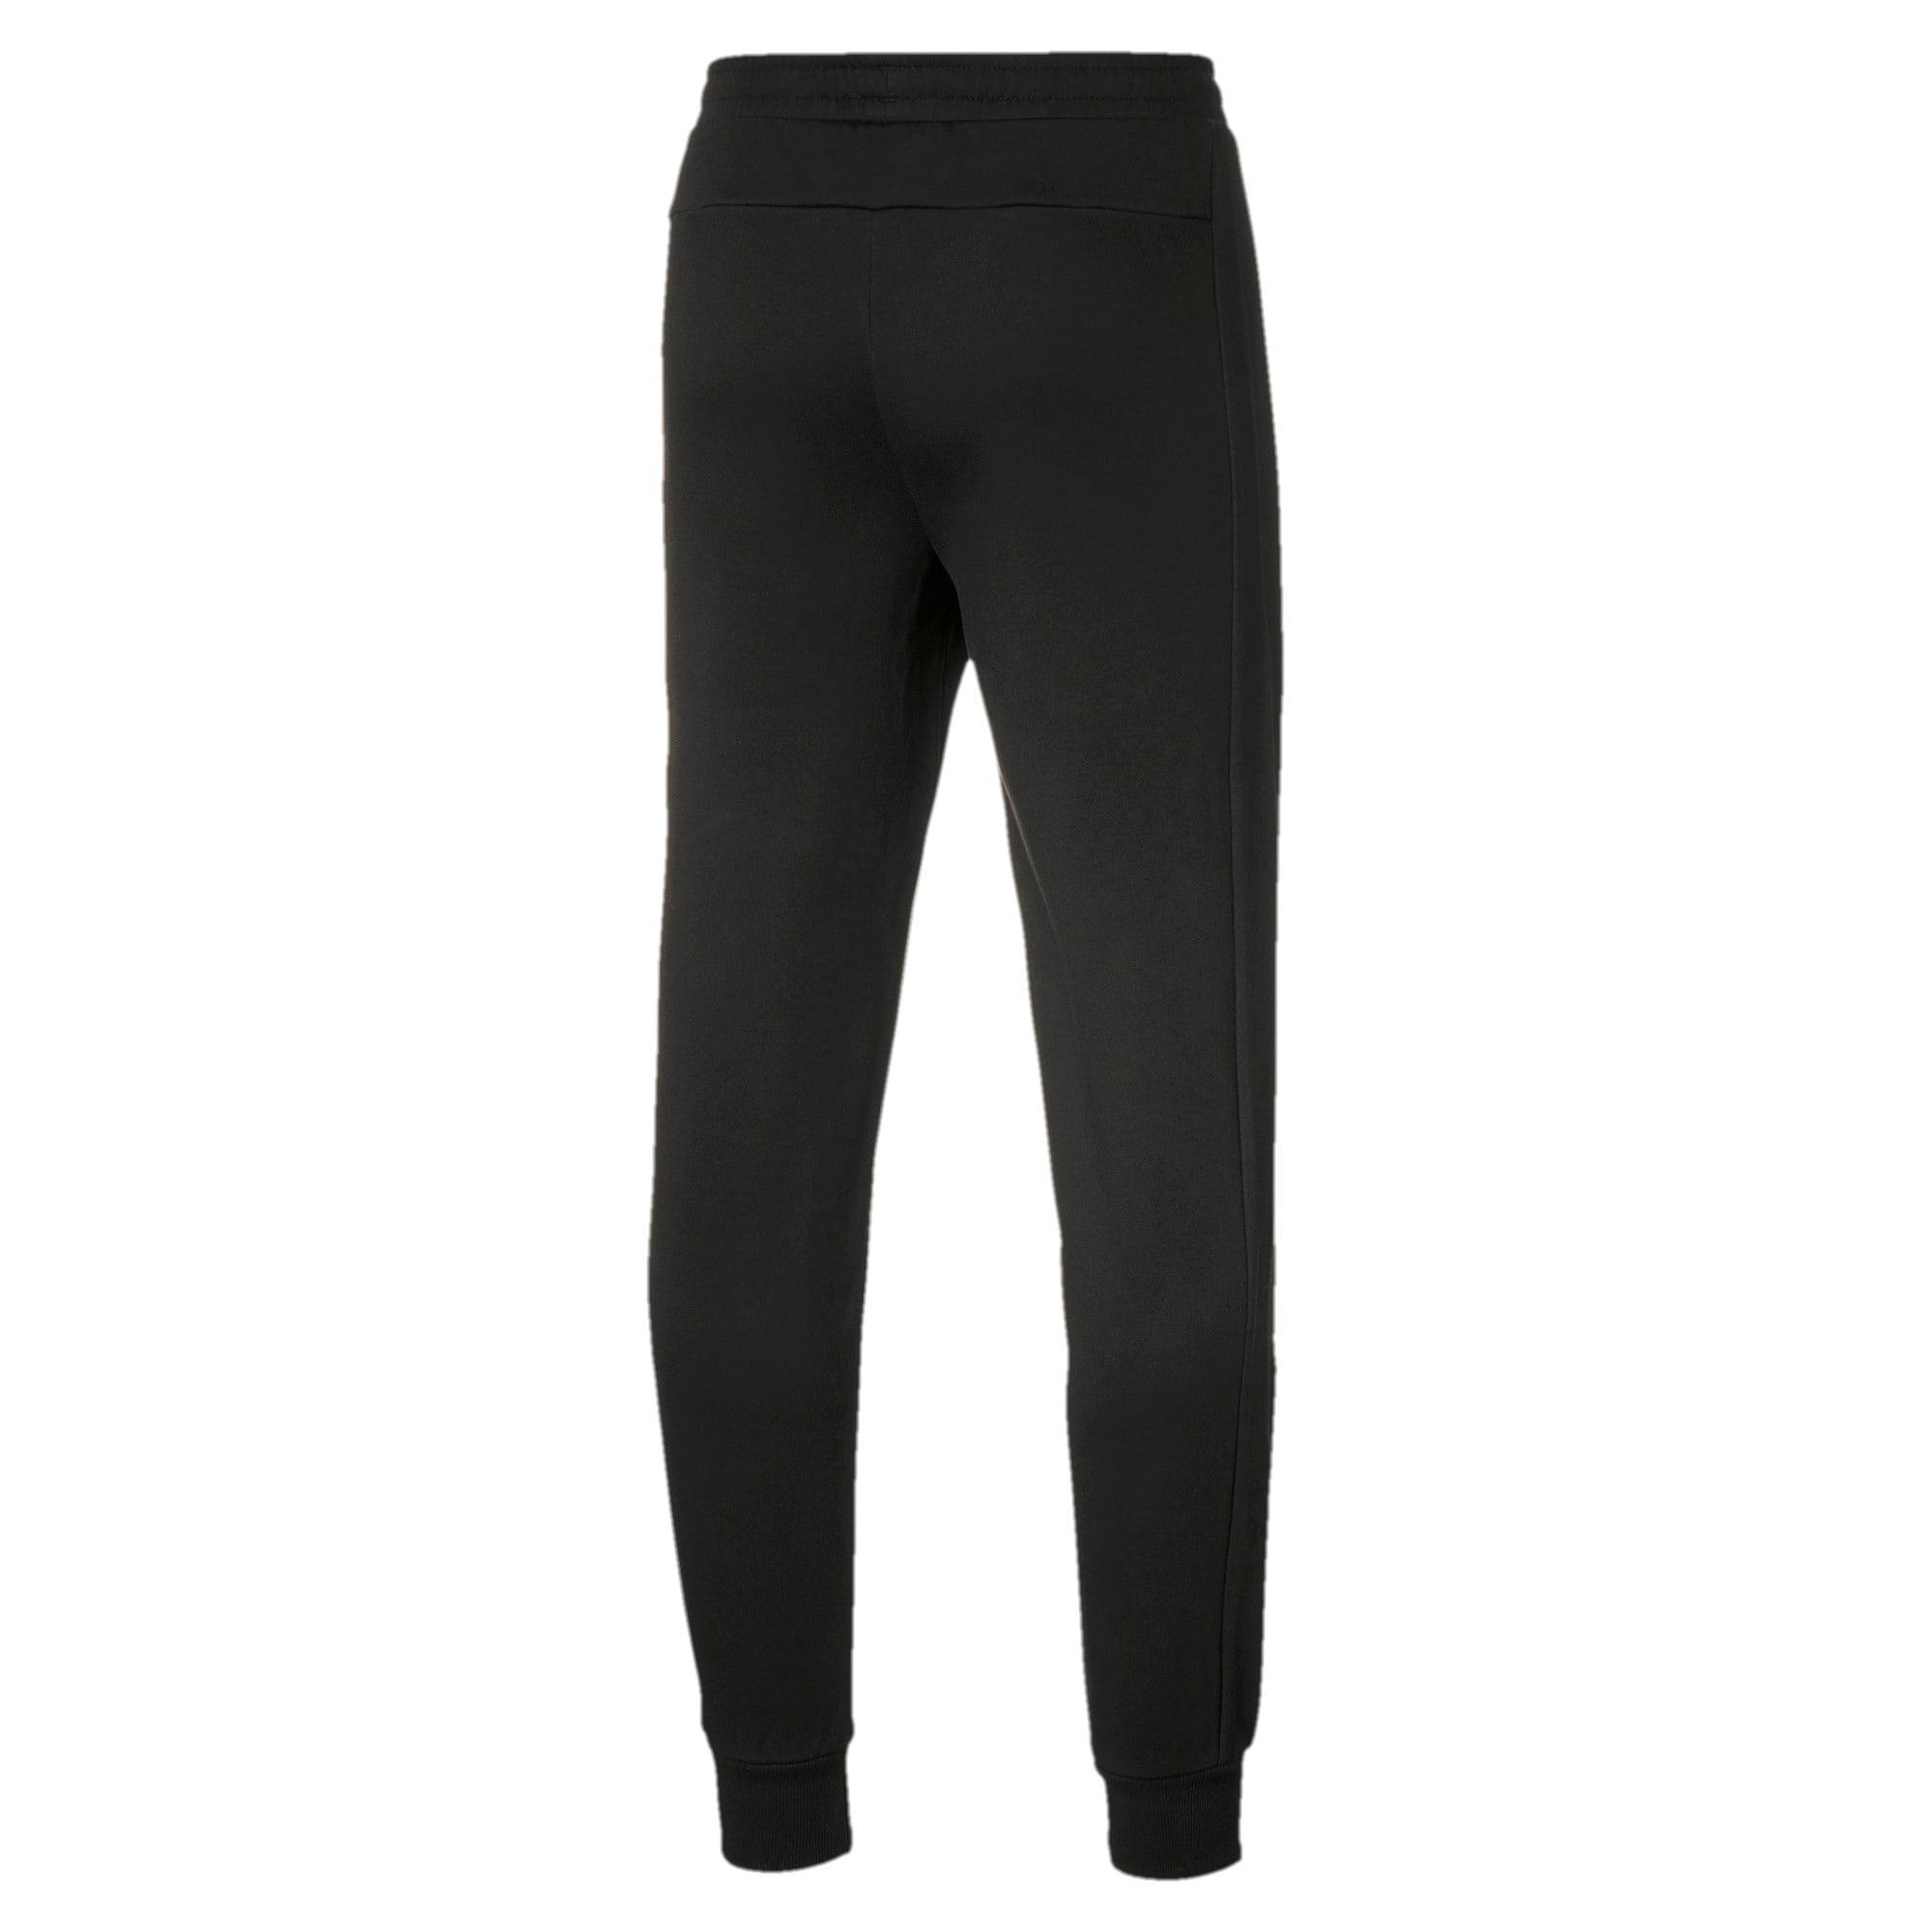 Thumbnail 2 of BMW M Motorsport Knitted Men's Sweatpants, Puma Black, medium